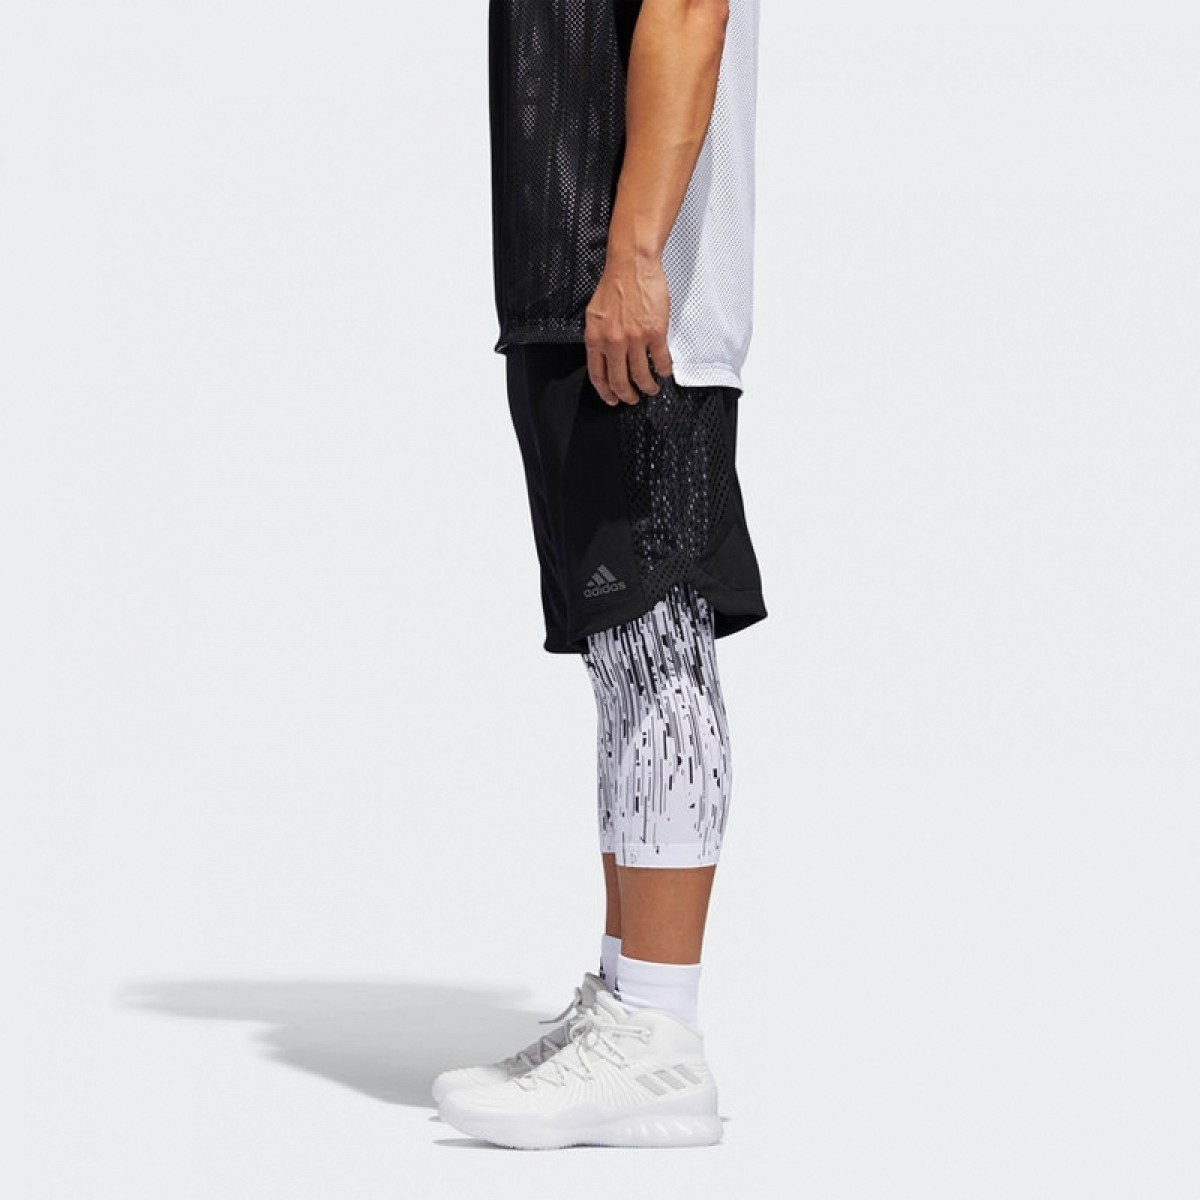 Adidas Electric Short & Tight 'Black' CE8744